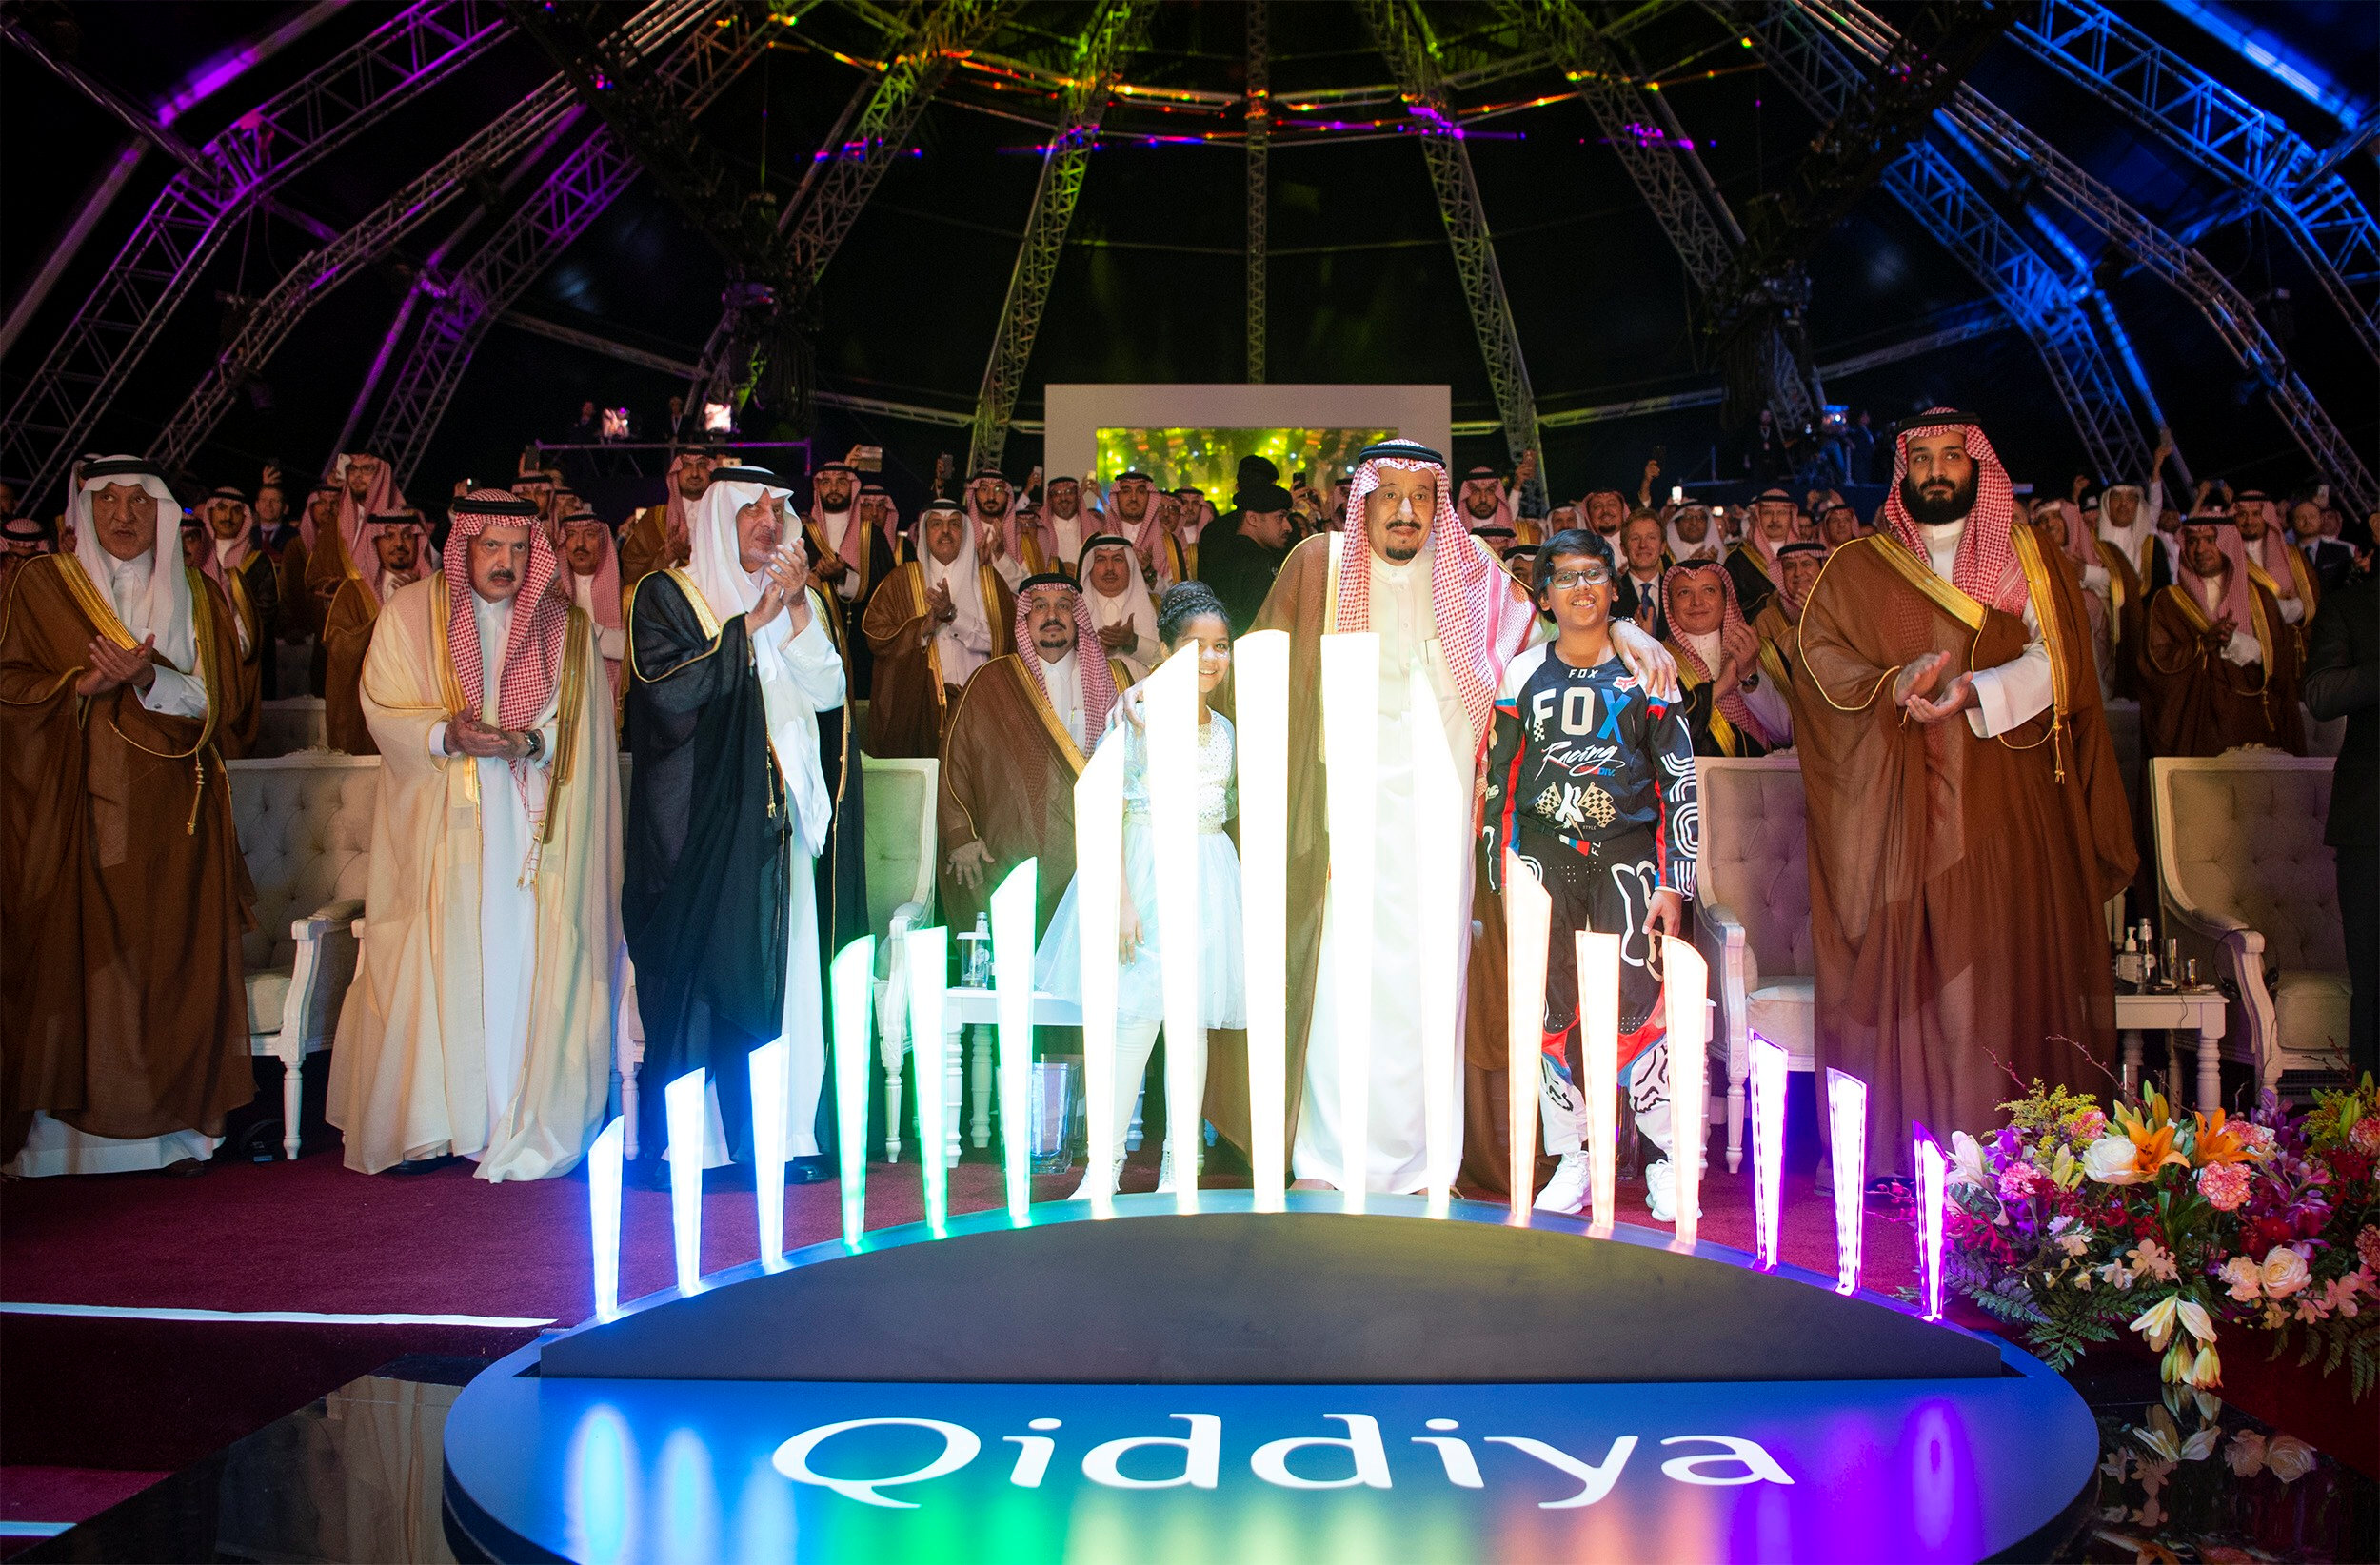 Saudi Arabia launches multi-billion dollar entertainment resort